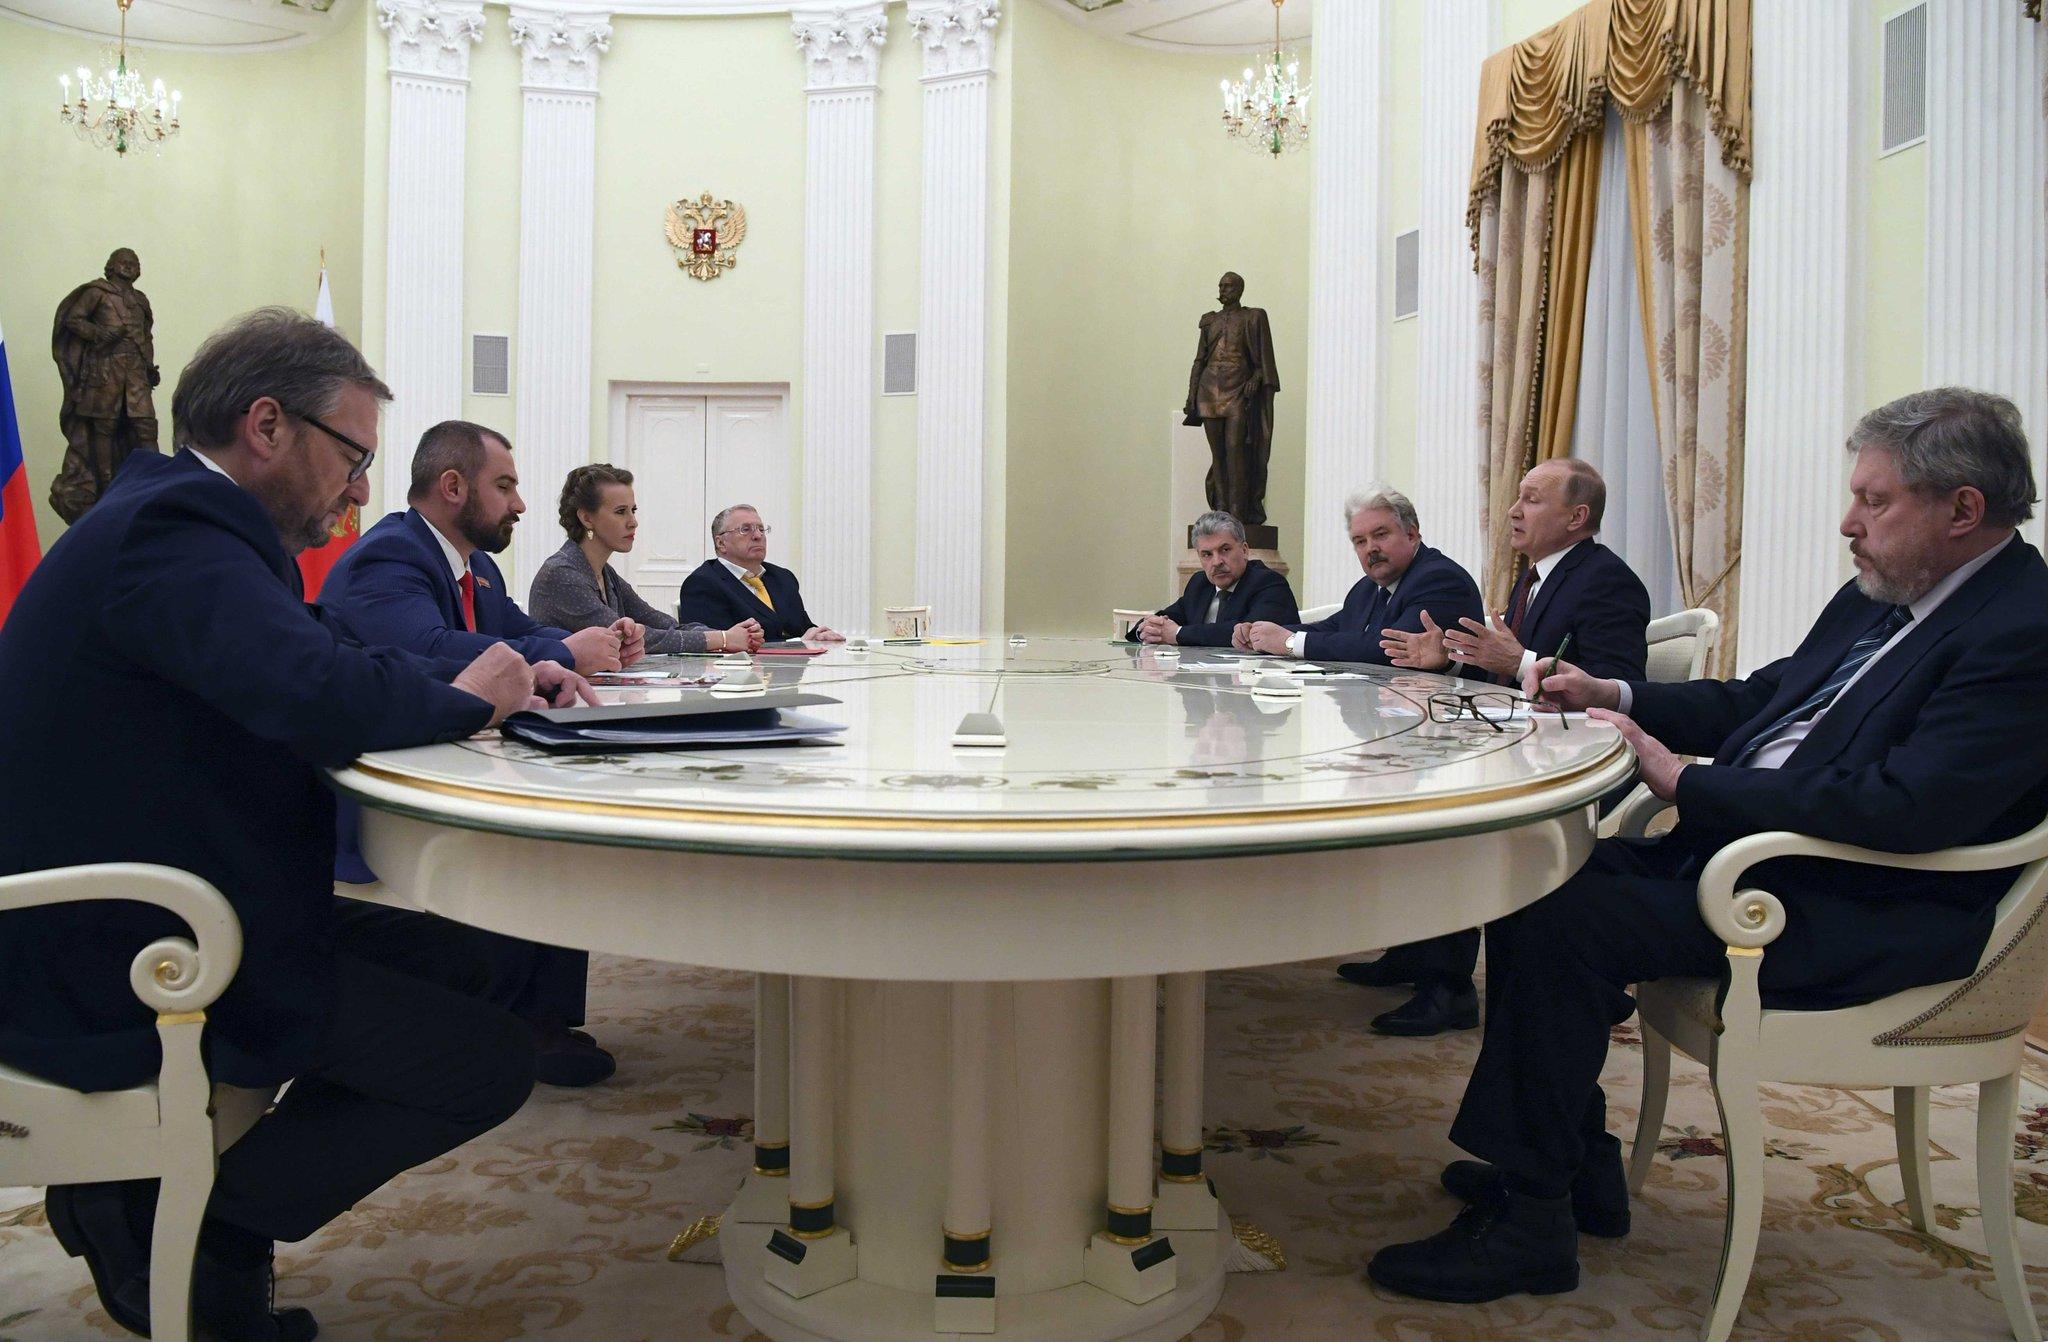 Встреча Владимира Путина с кандидатами в президенты фото